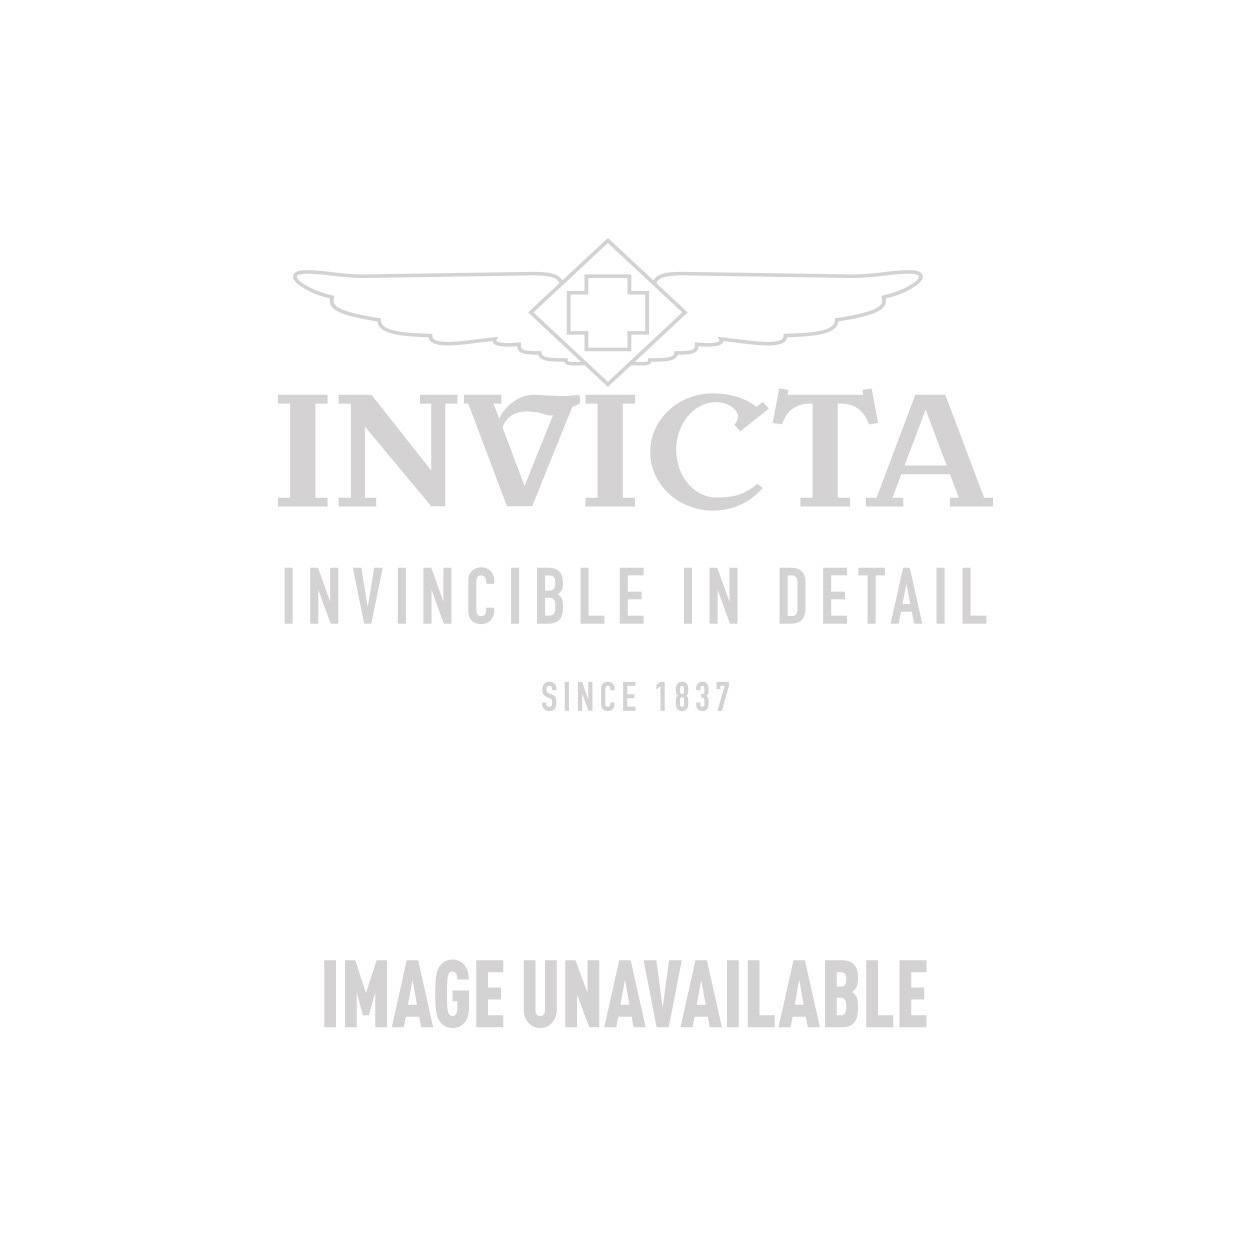 Invicta Bolt Swiss Made Quartz Watch - Orange, Stainless Steel case with Steel, Orange tone Stainless Steel band - Model 16315